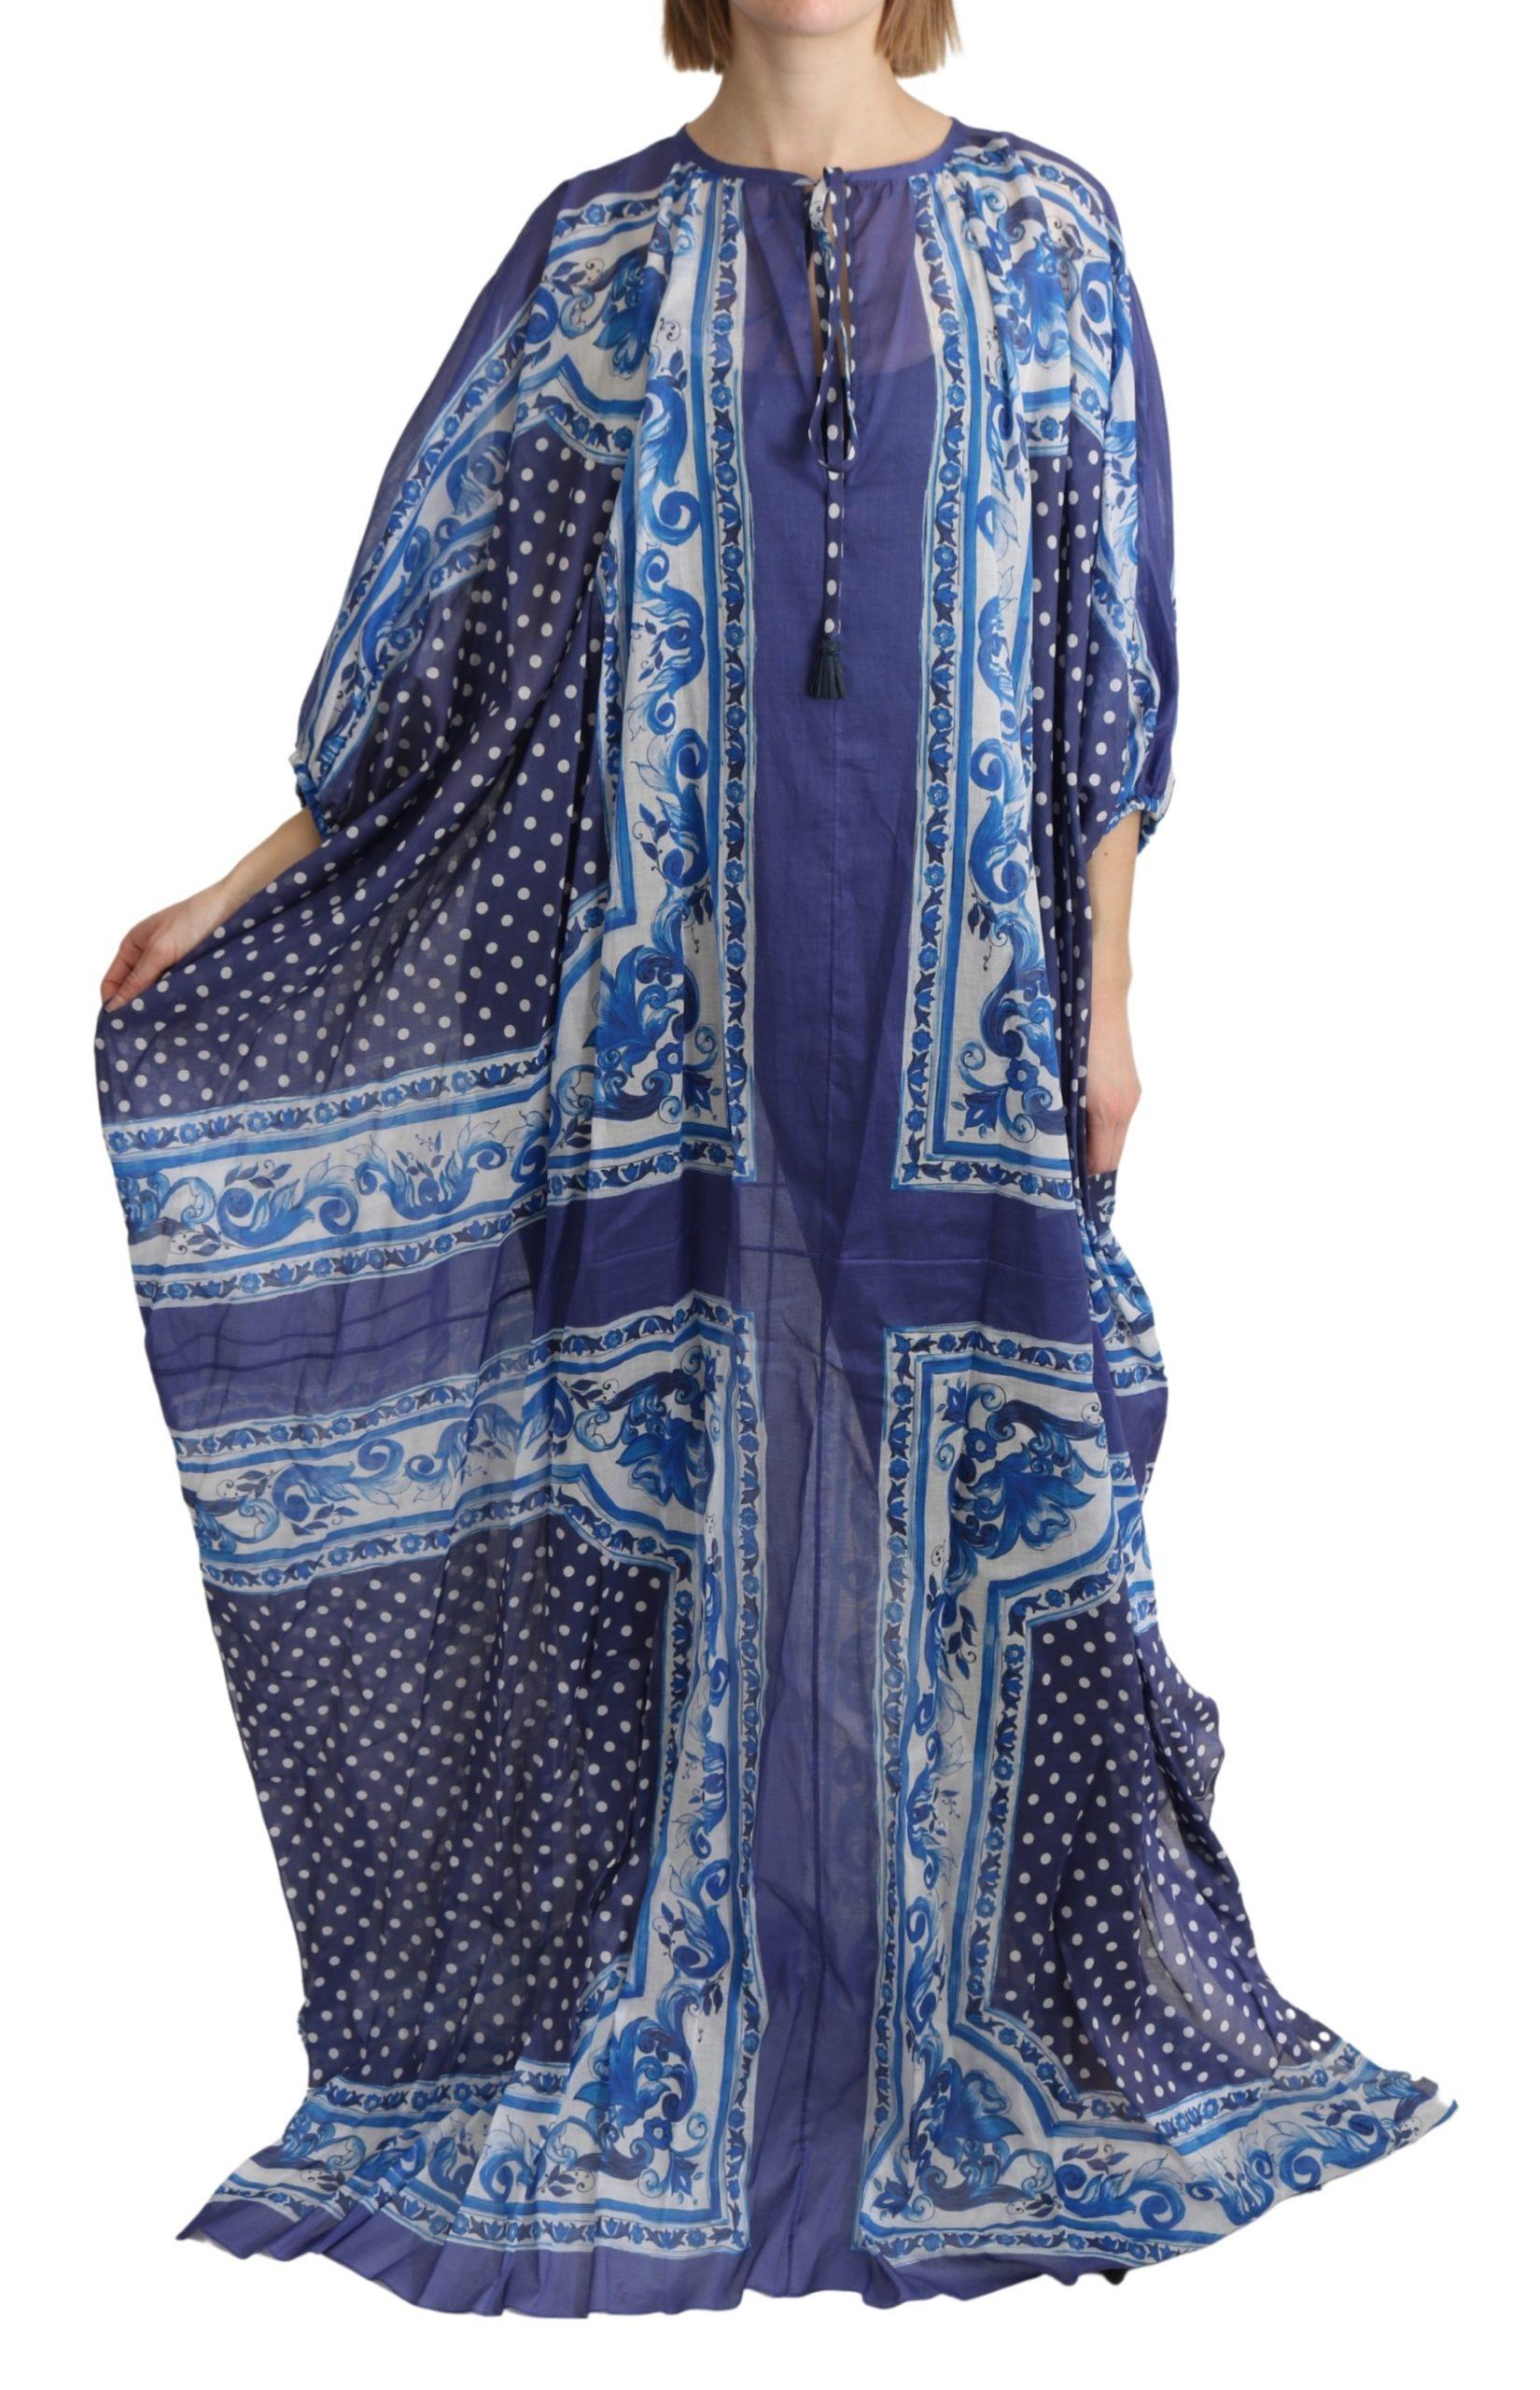 Dolce & Gabbana Women's Majolica Cape Cotton Dress Blue DR2602 - IT44|L